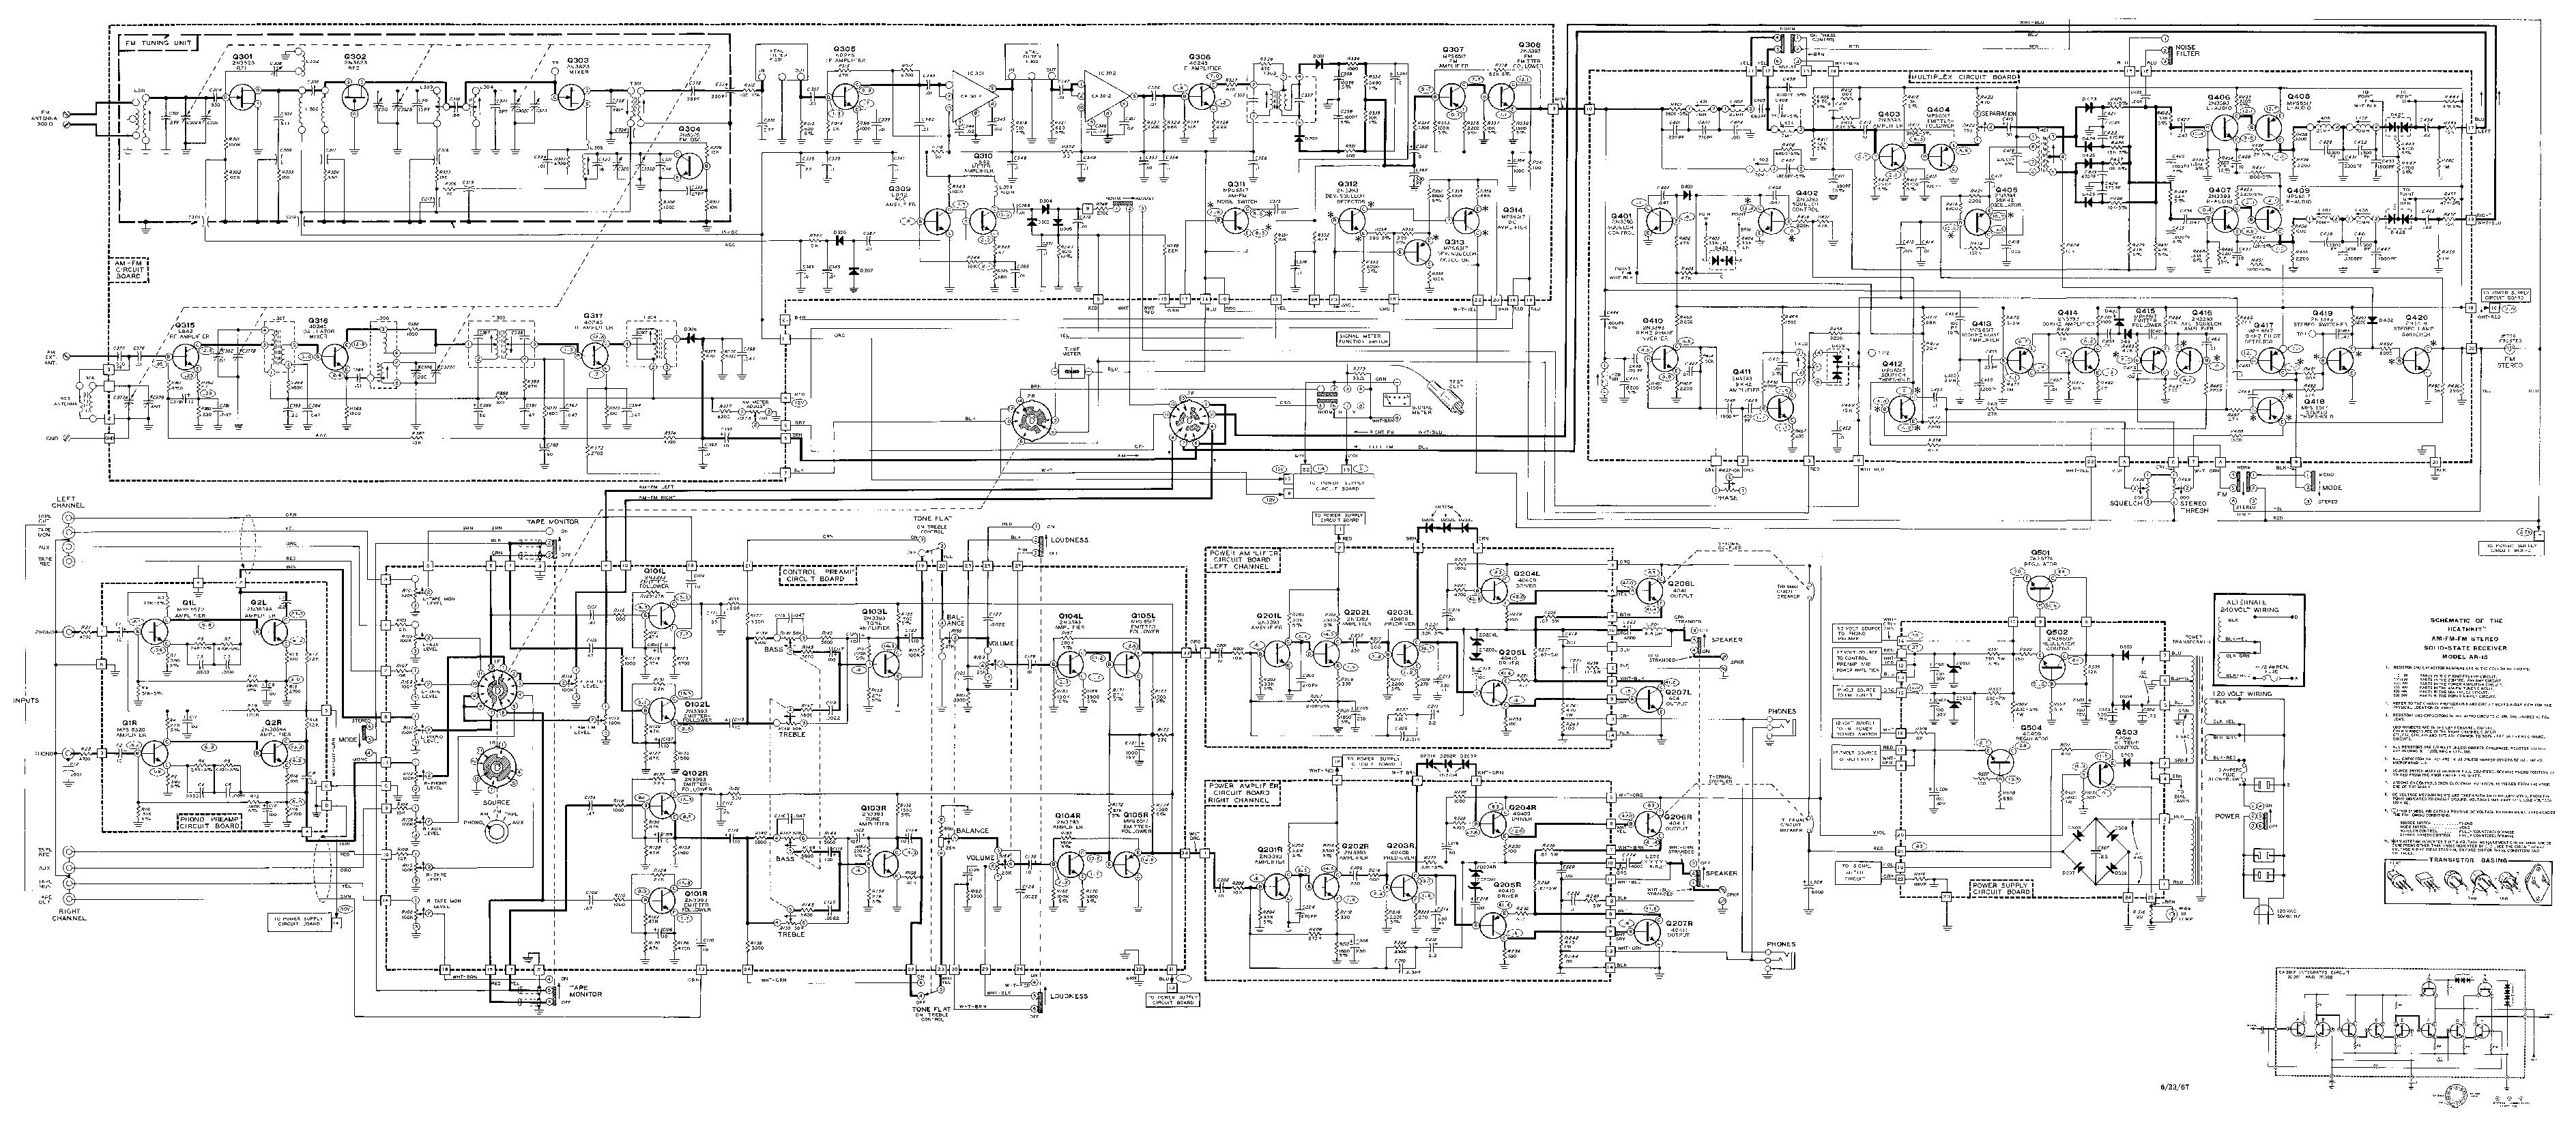 Ak-47 Blueprints Pdf Related Keywords & Suggestions - Ak-47